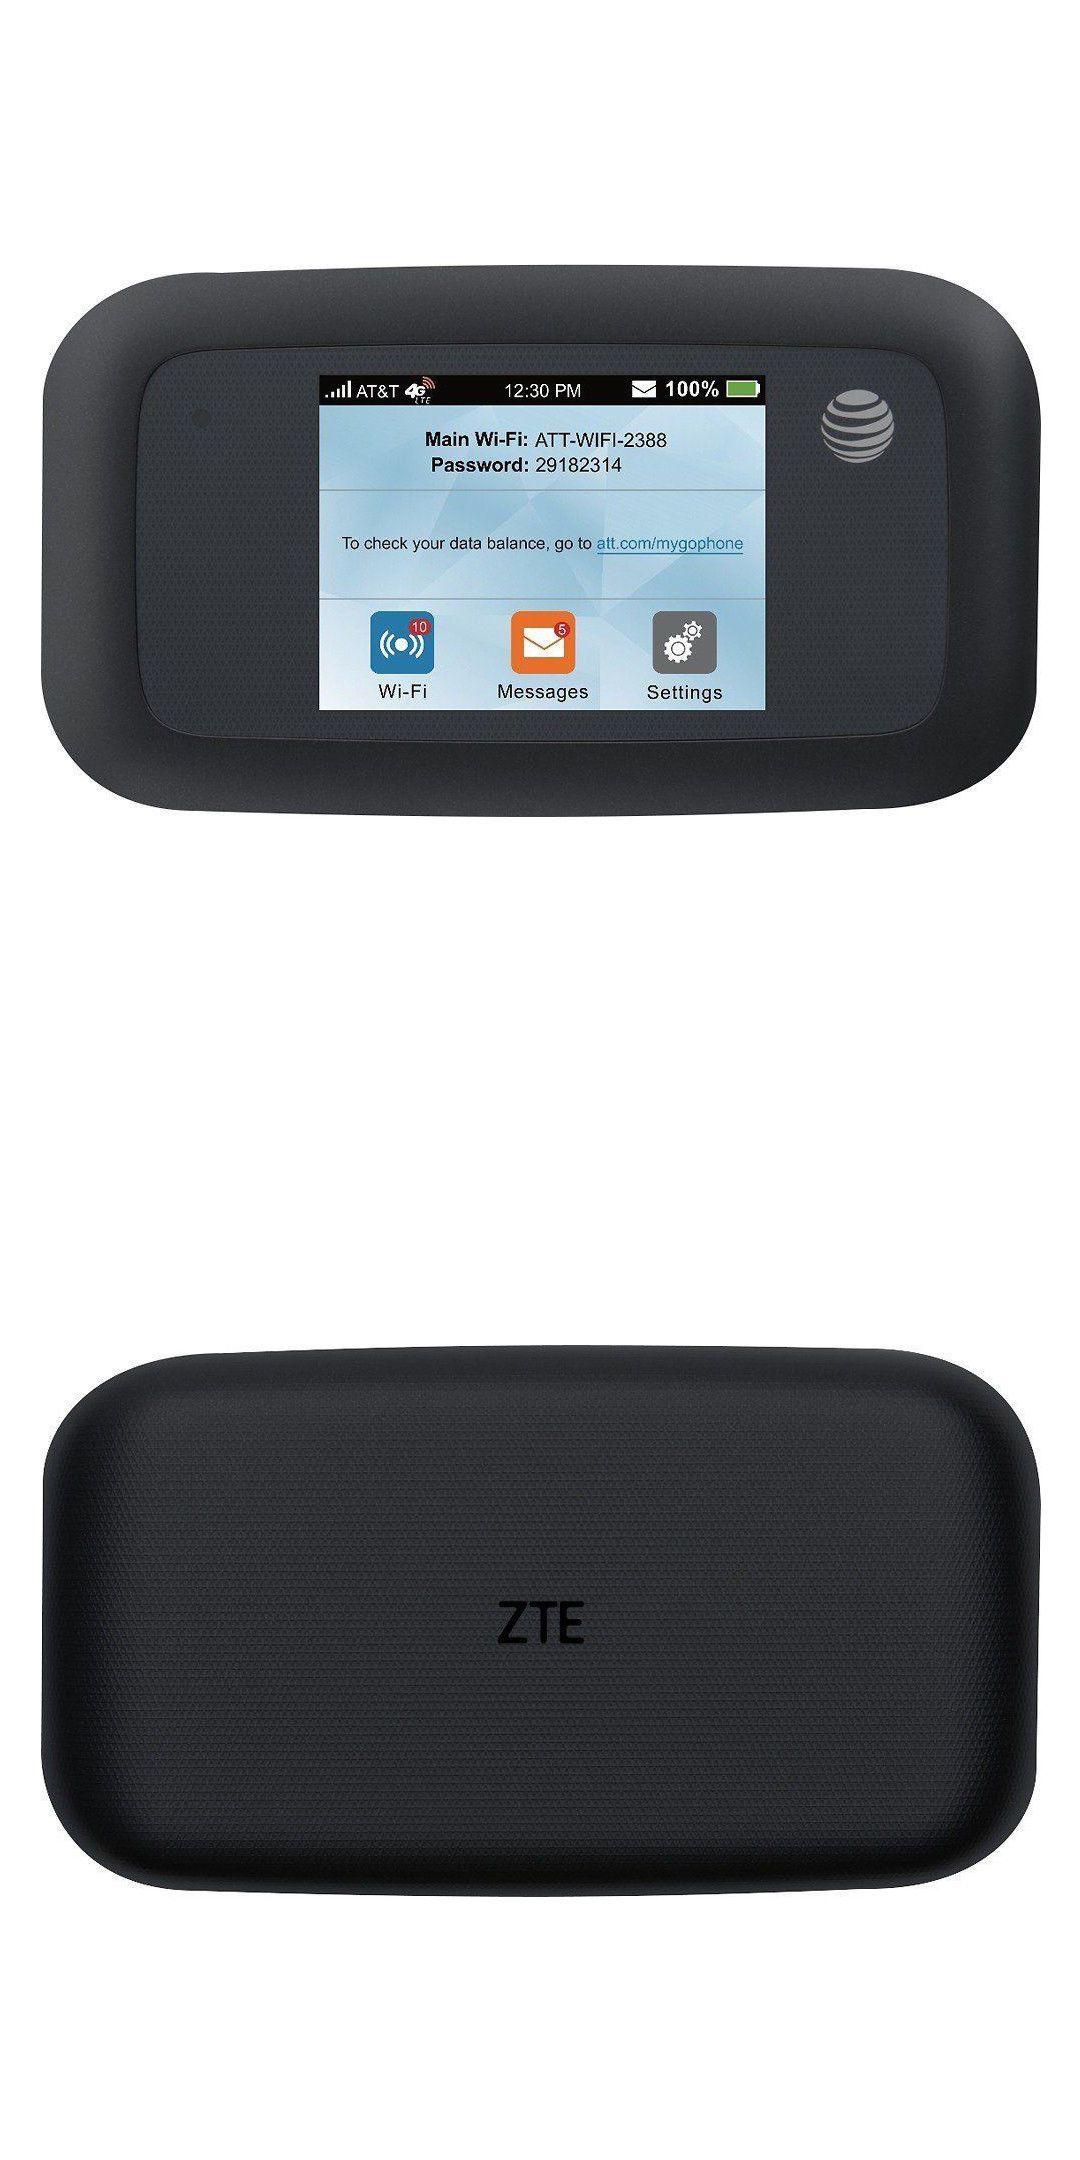 Mobile Broadband Devices 175710: Atandt Zte Velocity 4G Lte